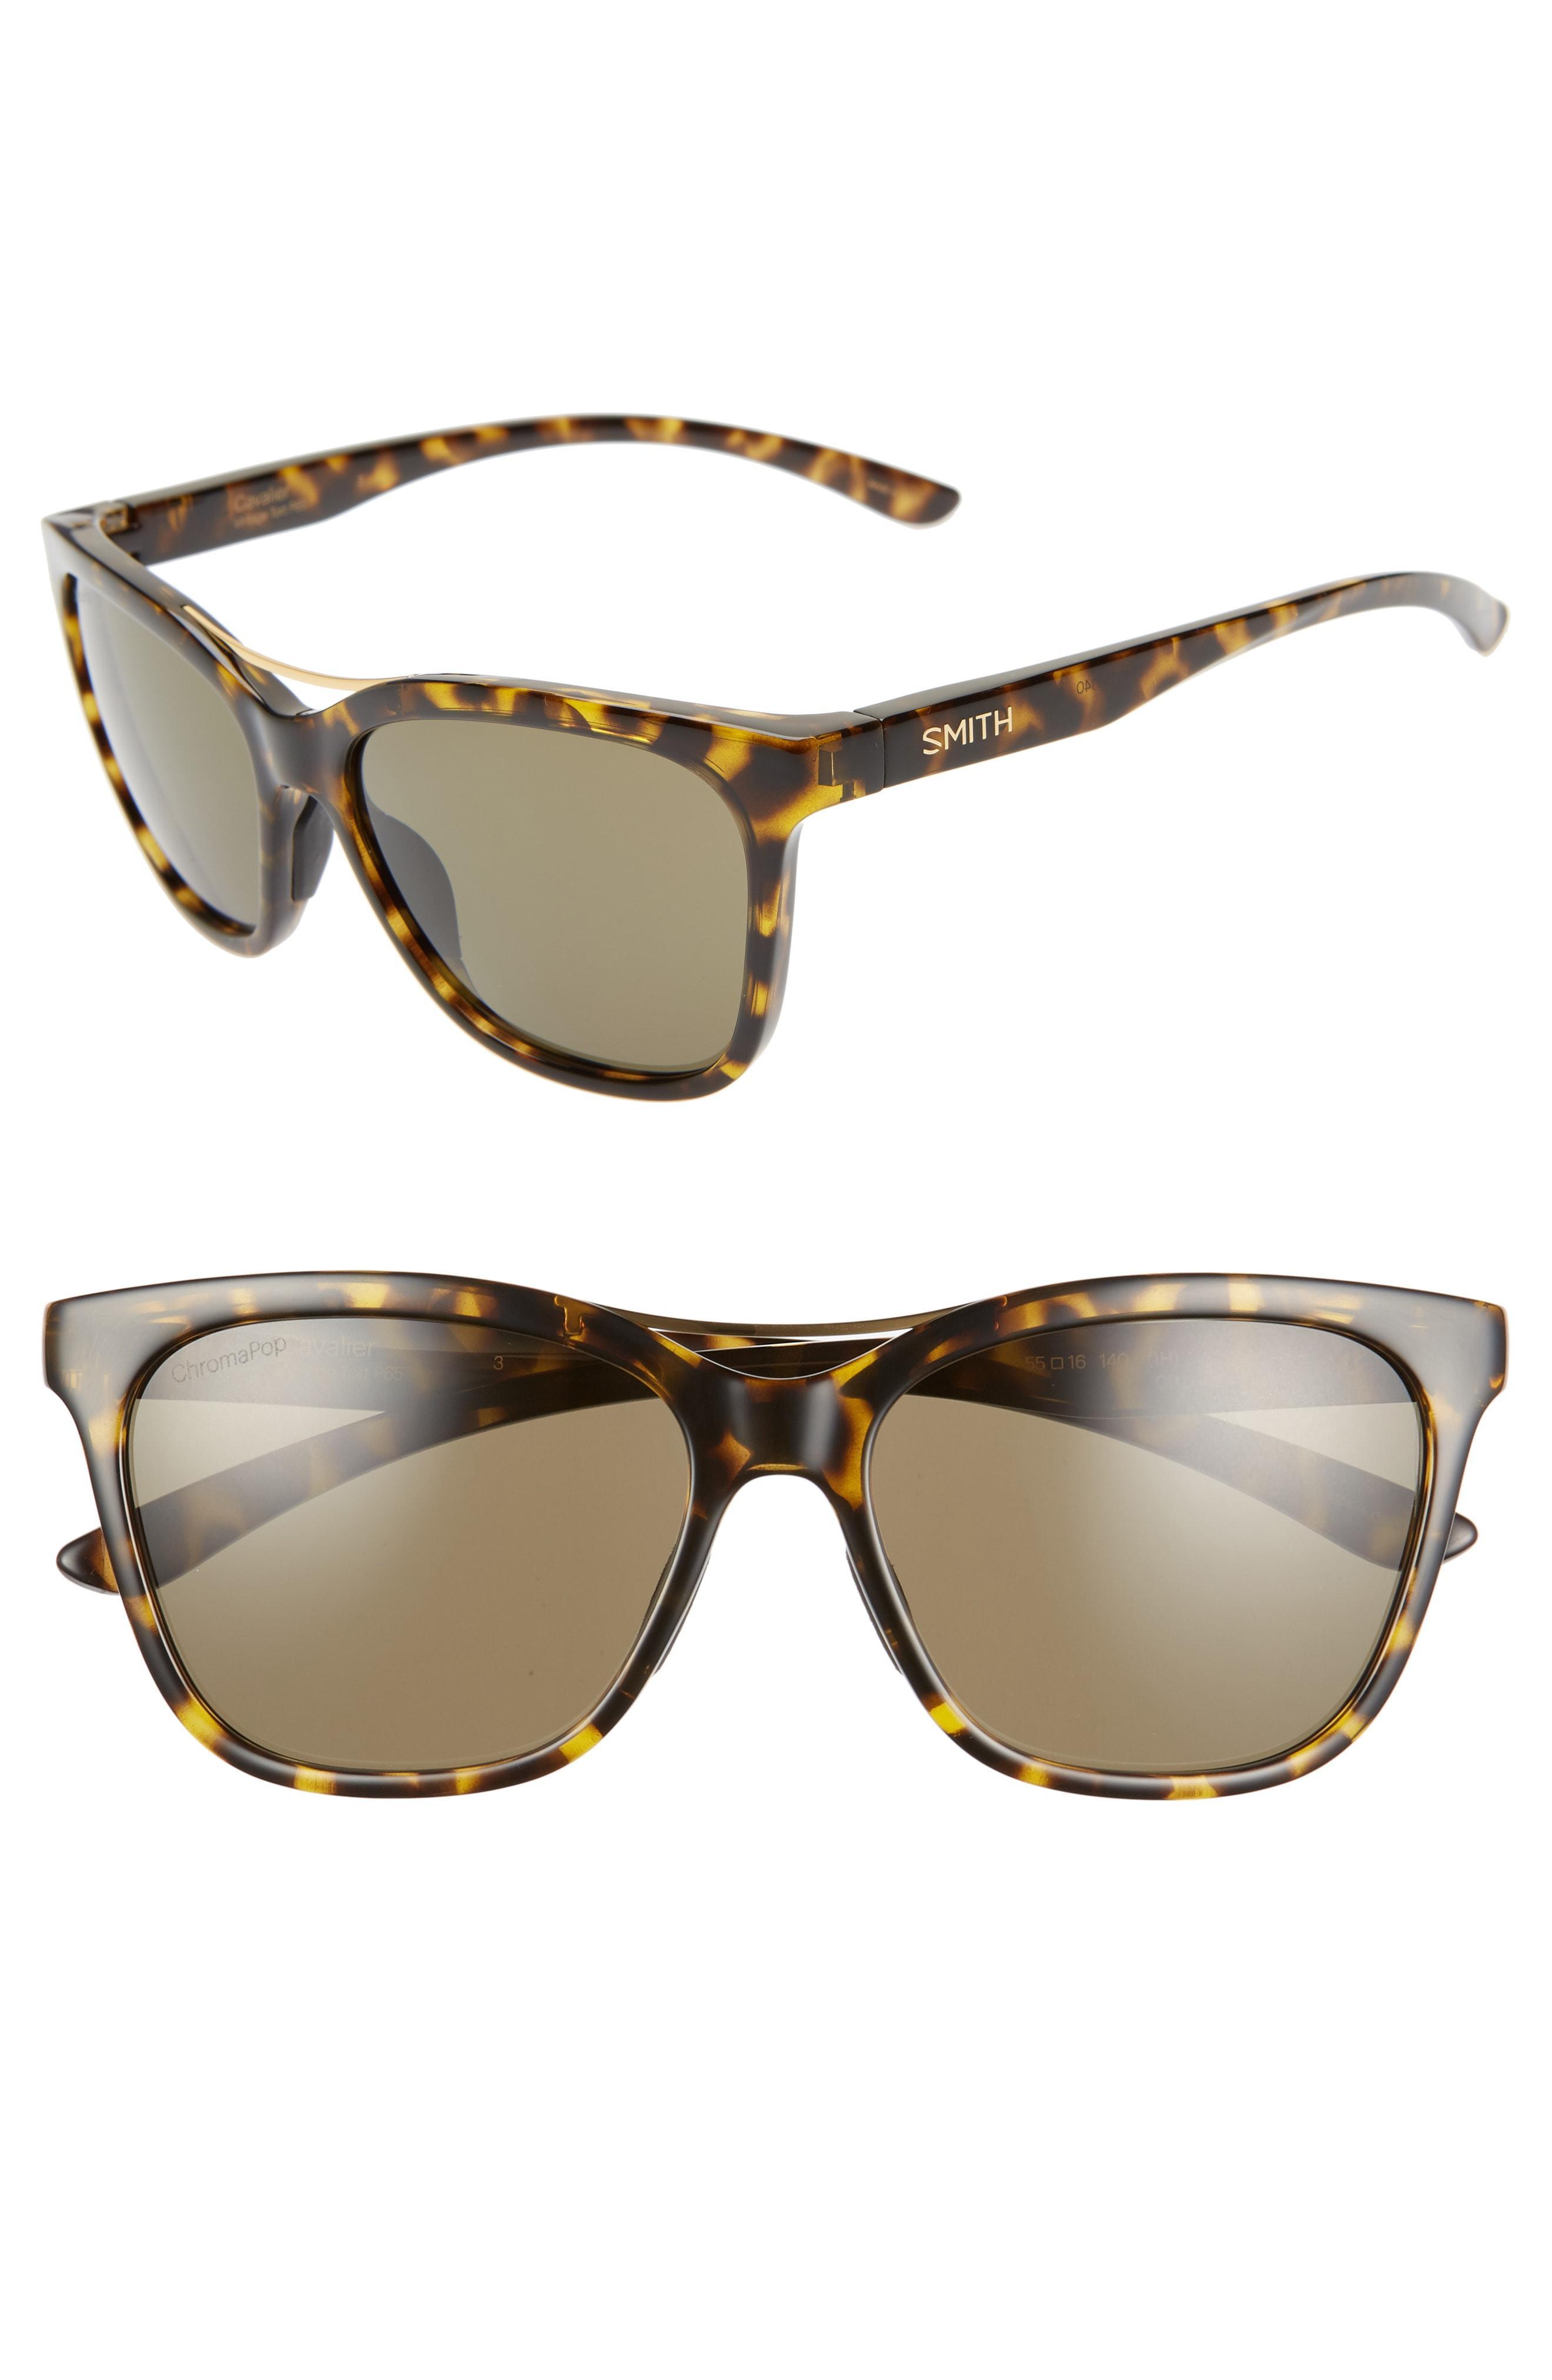 67fd58d838 Smith - Brown Cavalier 55mm Chromapop(tm) Polarized Cat Eye Sunglasses - -  Lyst. View fullscreen